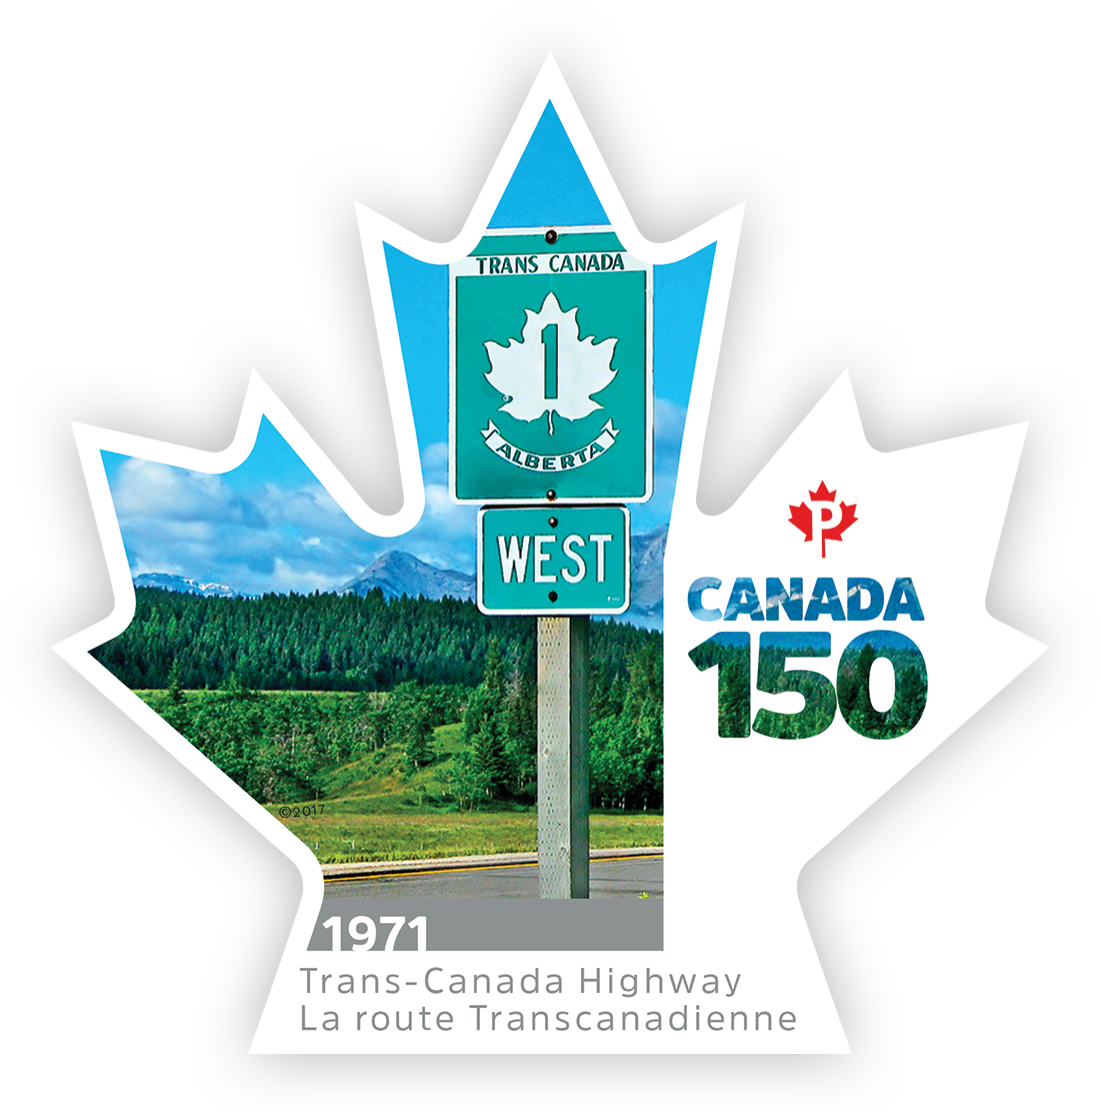 Trans-Canada Highway - Canada 150 Canada Postage Stamp